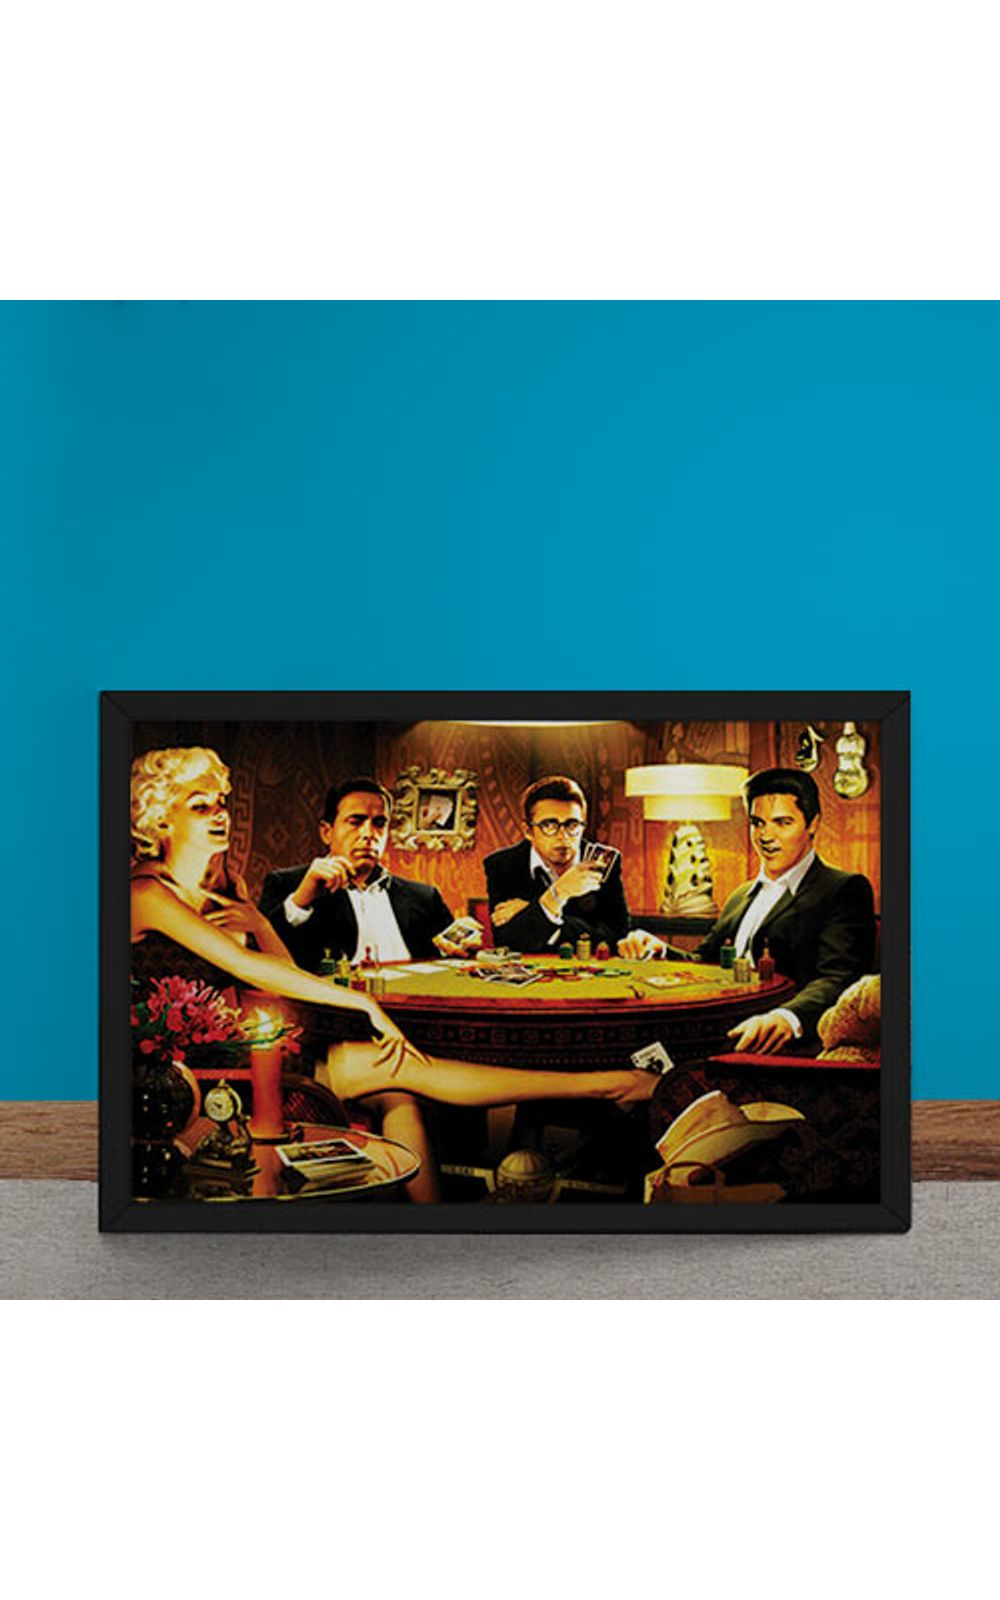 Foto 6 - Quadro Decorativo Baralho Marilyn Monroes Elvis Presley James Dean Humphrey Bogart